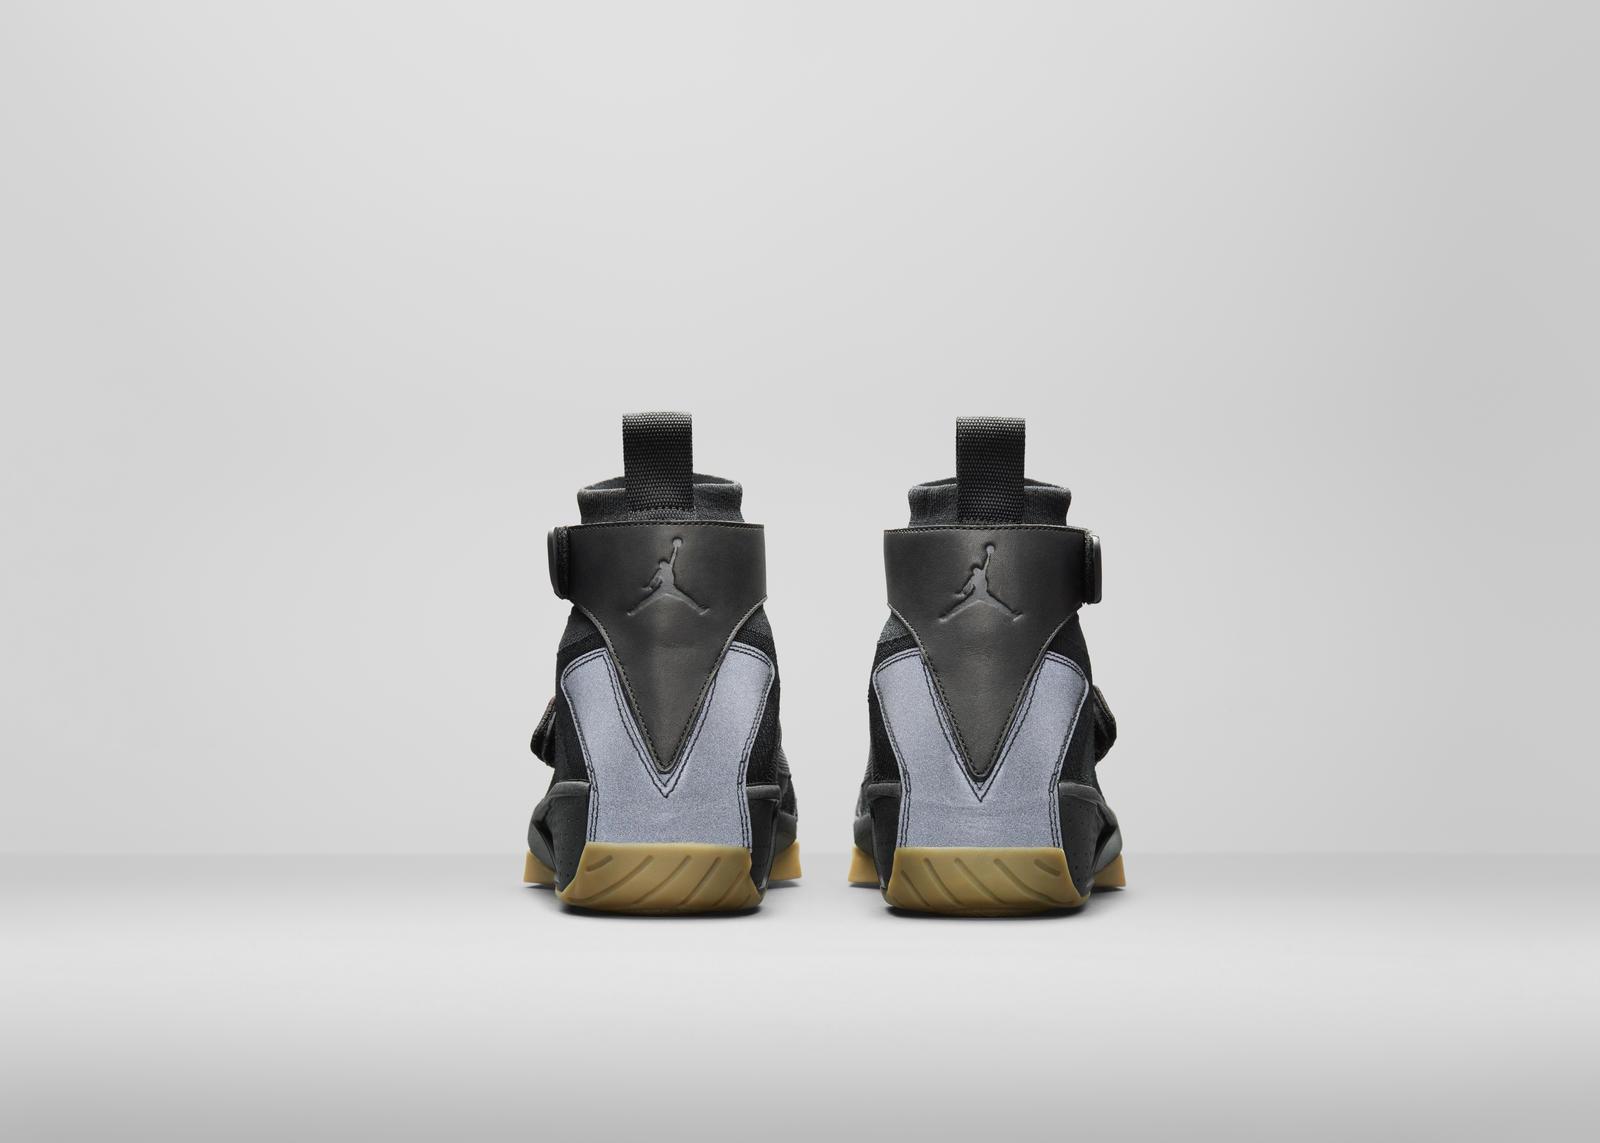 d6ab1a59cf5b Jordan Brand x Carmelo Anthony x Rag   Bone Capsule - Nike News